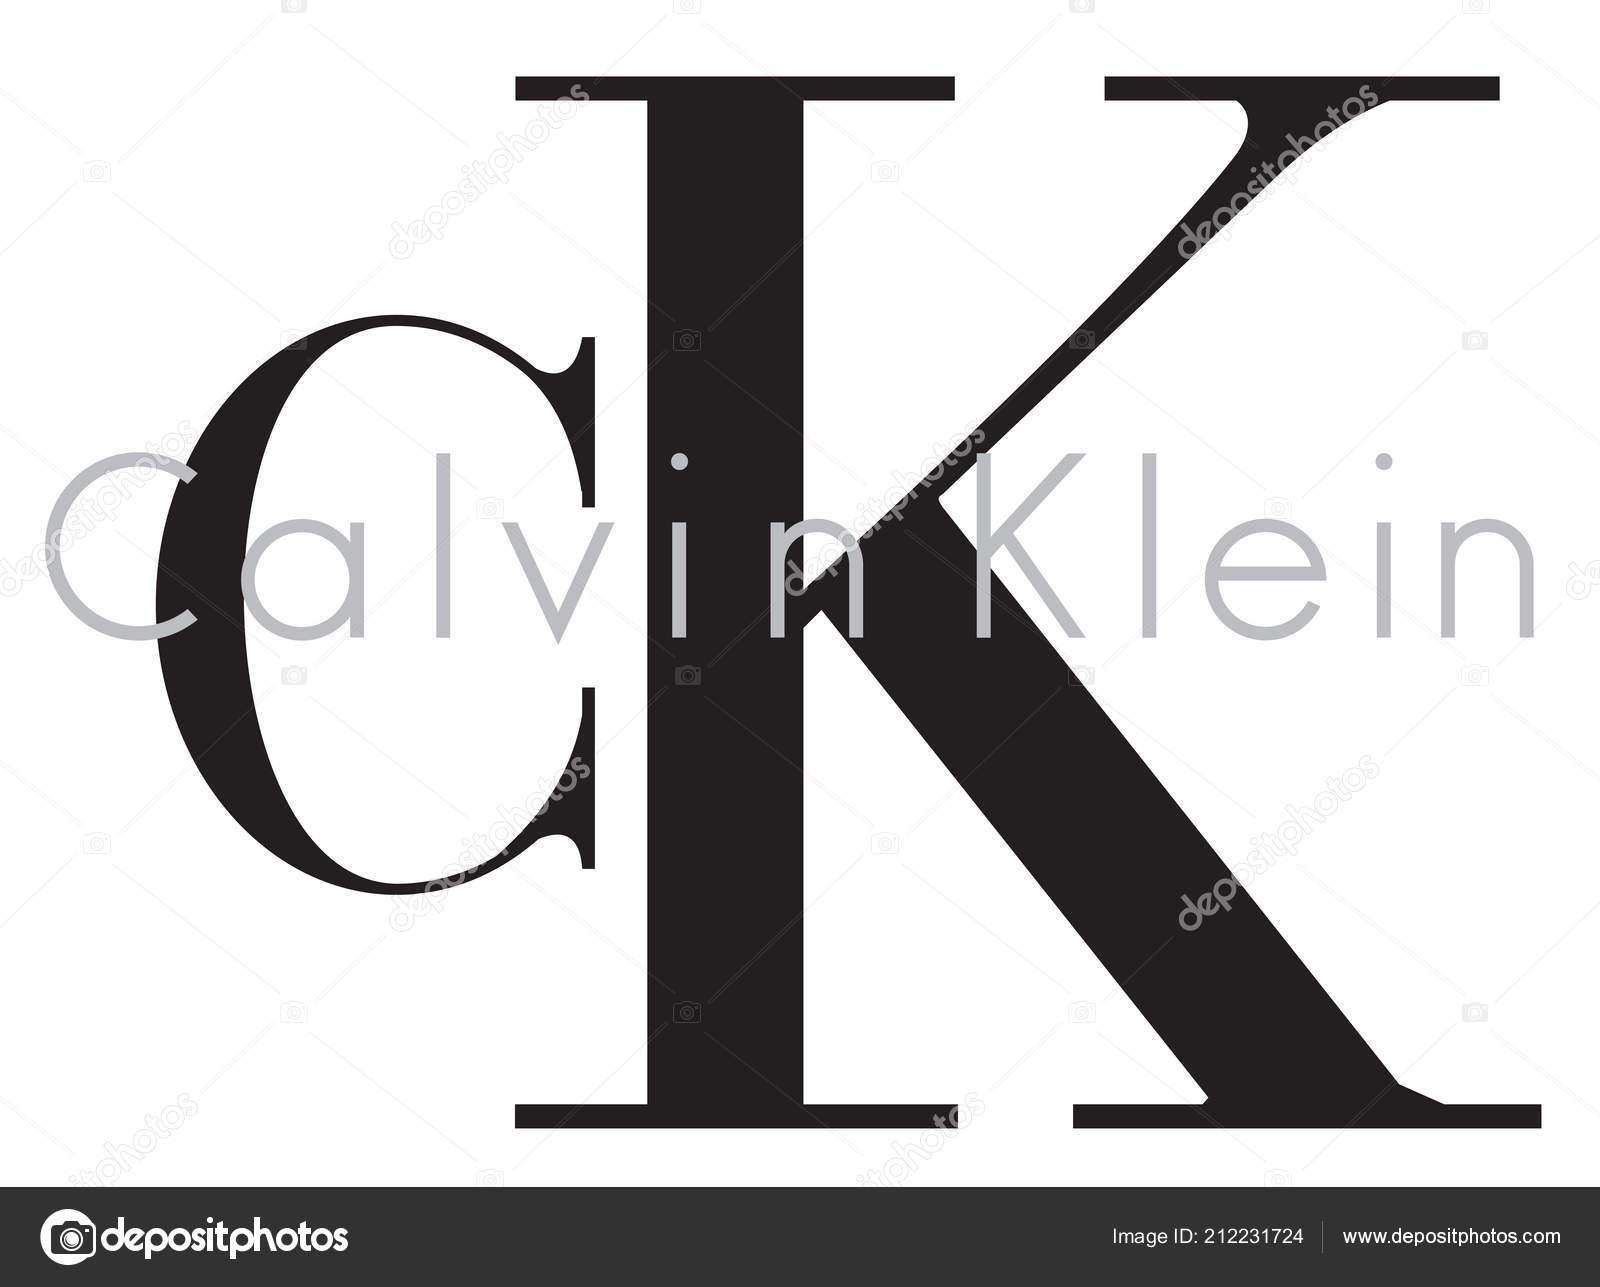 9a5041cf7edfd9 Calvin Klein Logo Luxus Mode Marke Kleidung Illustratio– Redaktionelle  Stock-Fototografie